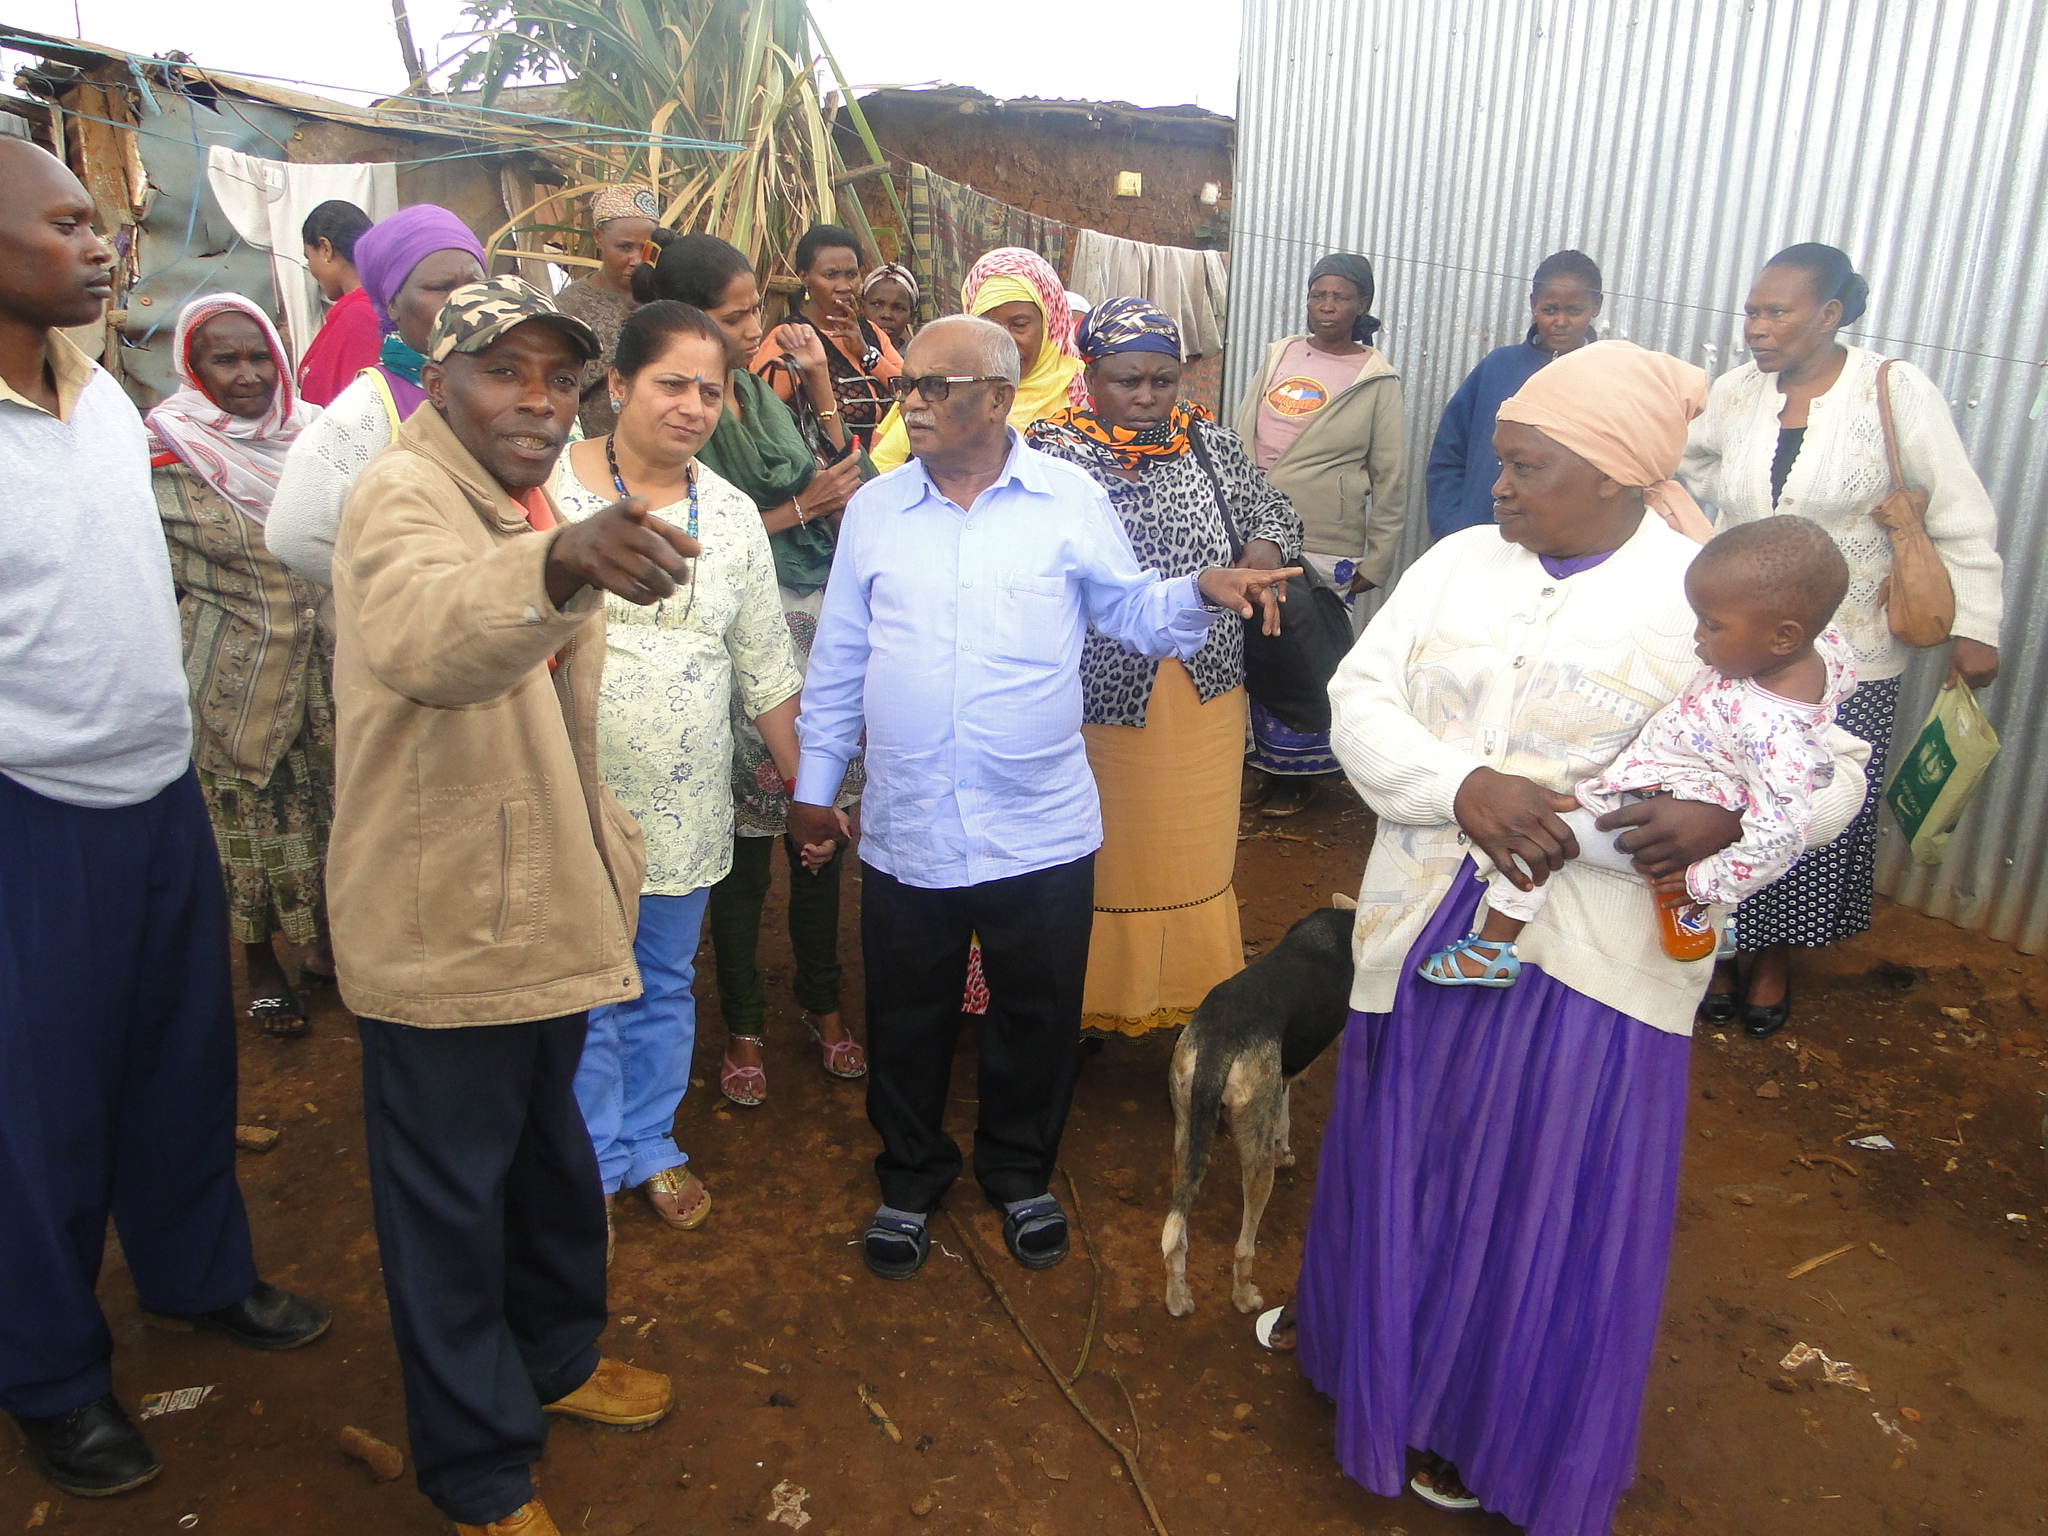 Dr. Jockin takes a tour of Kiandutu Slums, Thika Kenya